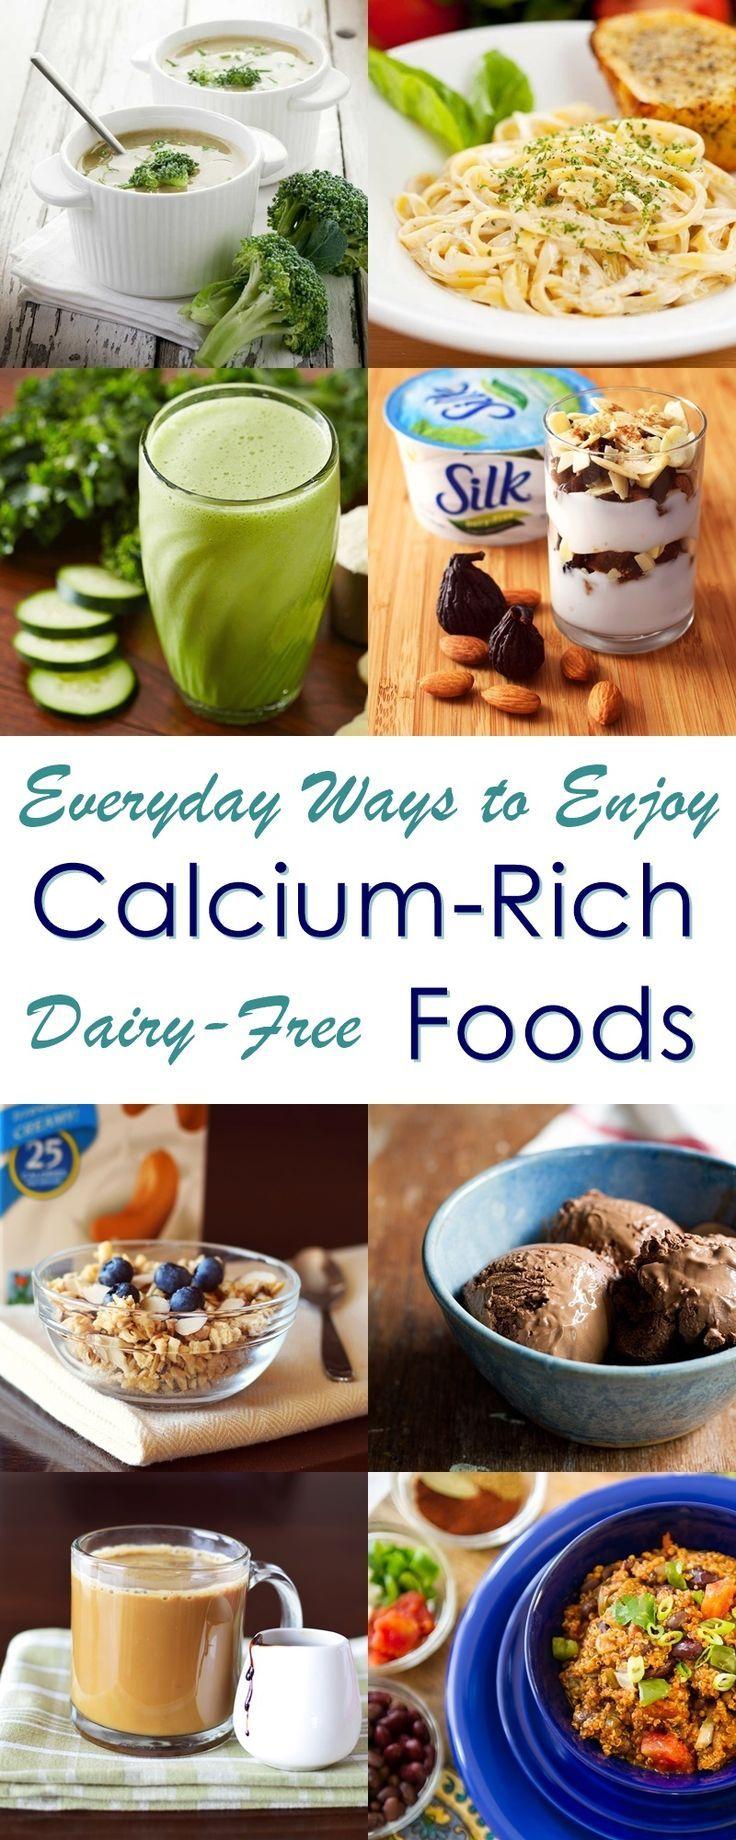 Calcium rich foods over 25 everyday ways to enjoy them calcium calcium rich foods over 25 everyday ways to enjoy them forumfinder Gallery